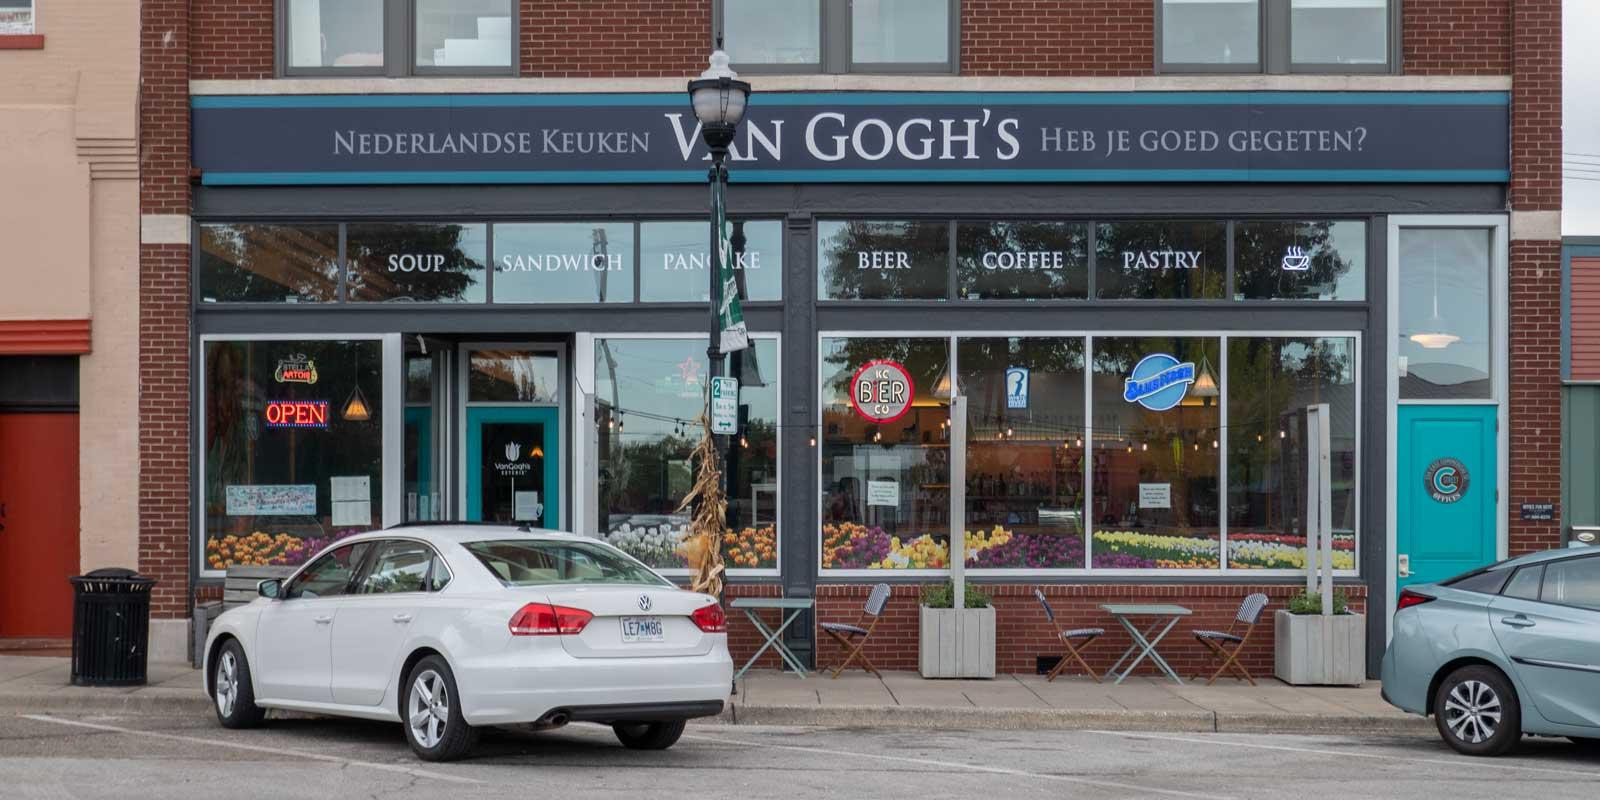 Van Gogh's Springfield Missouri